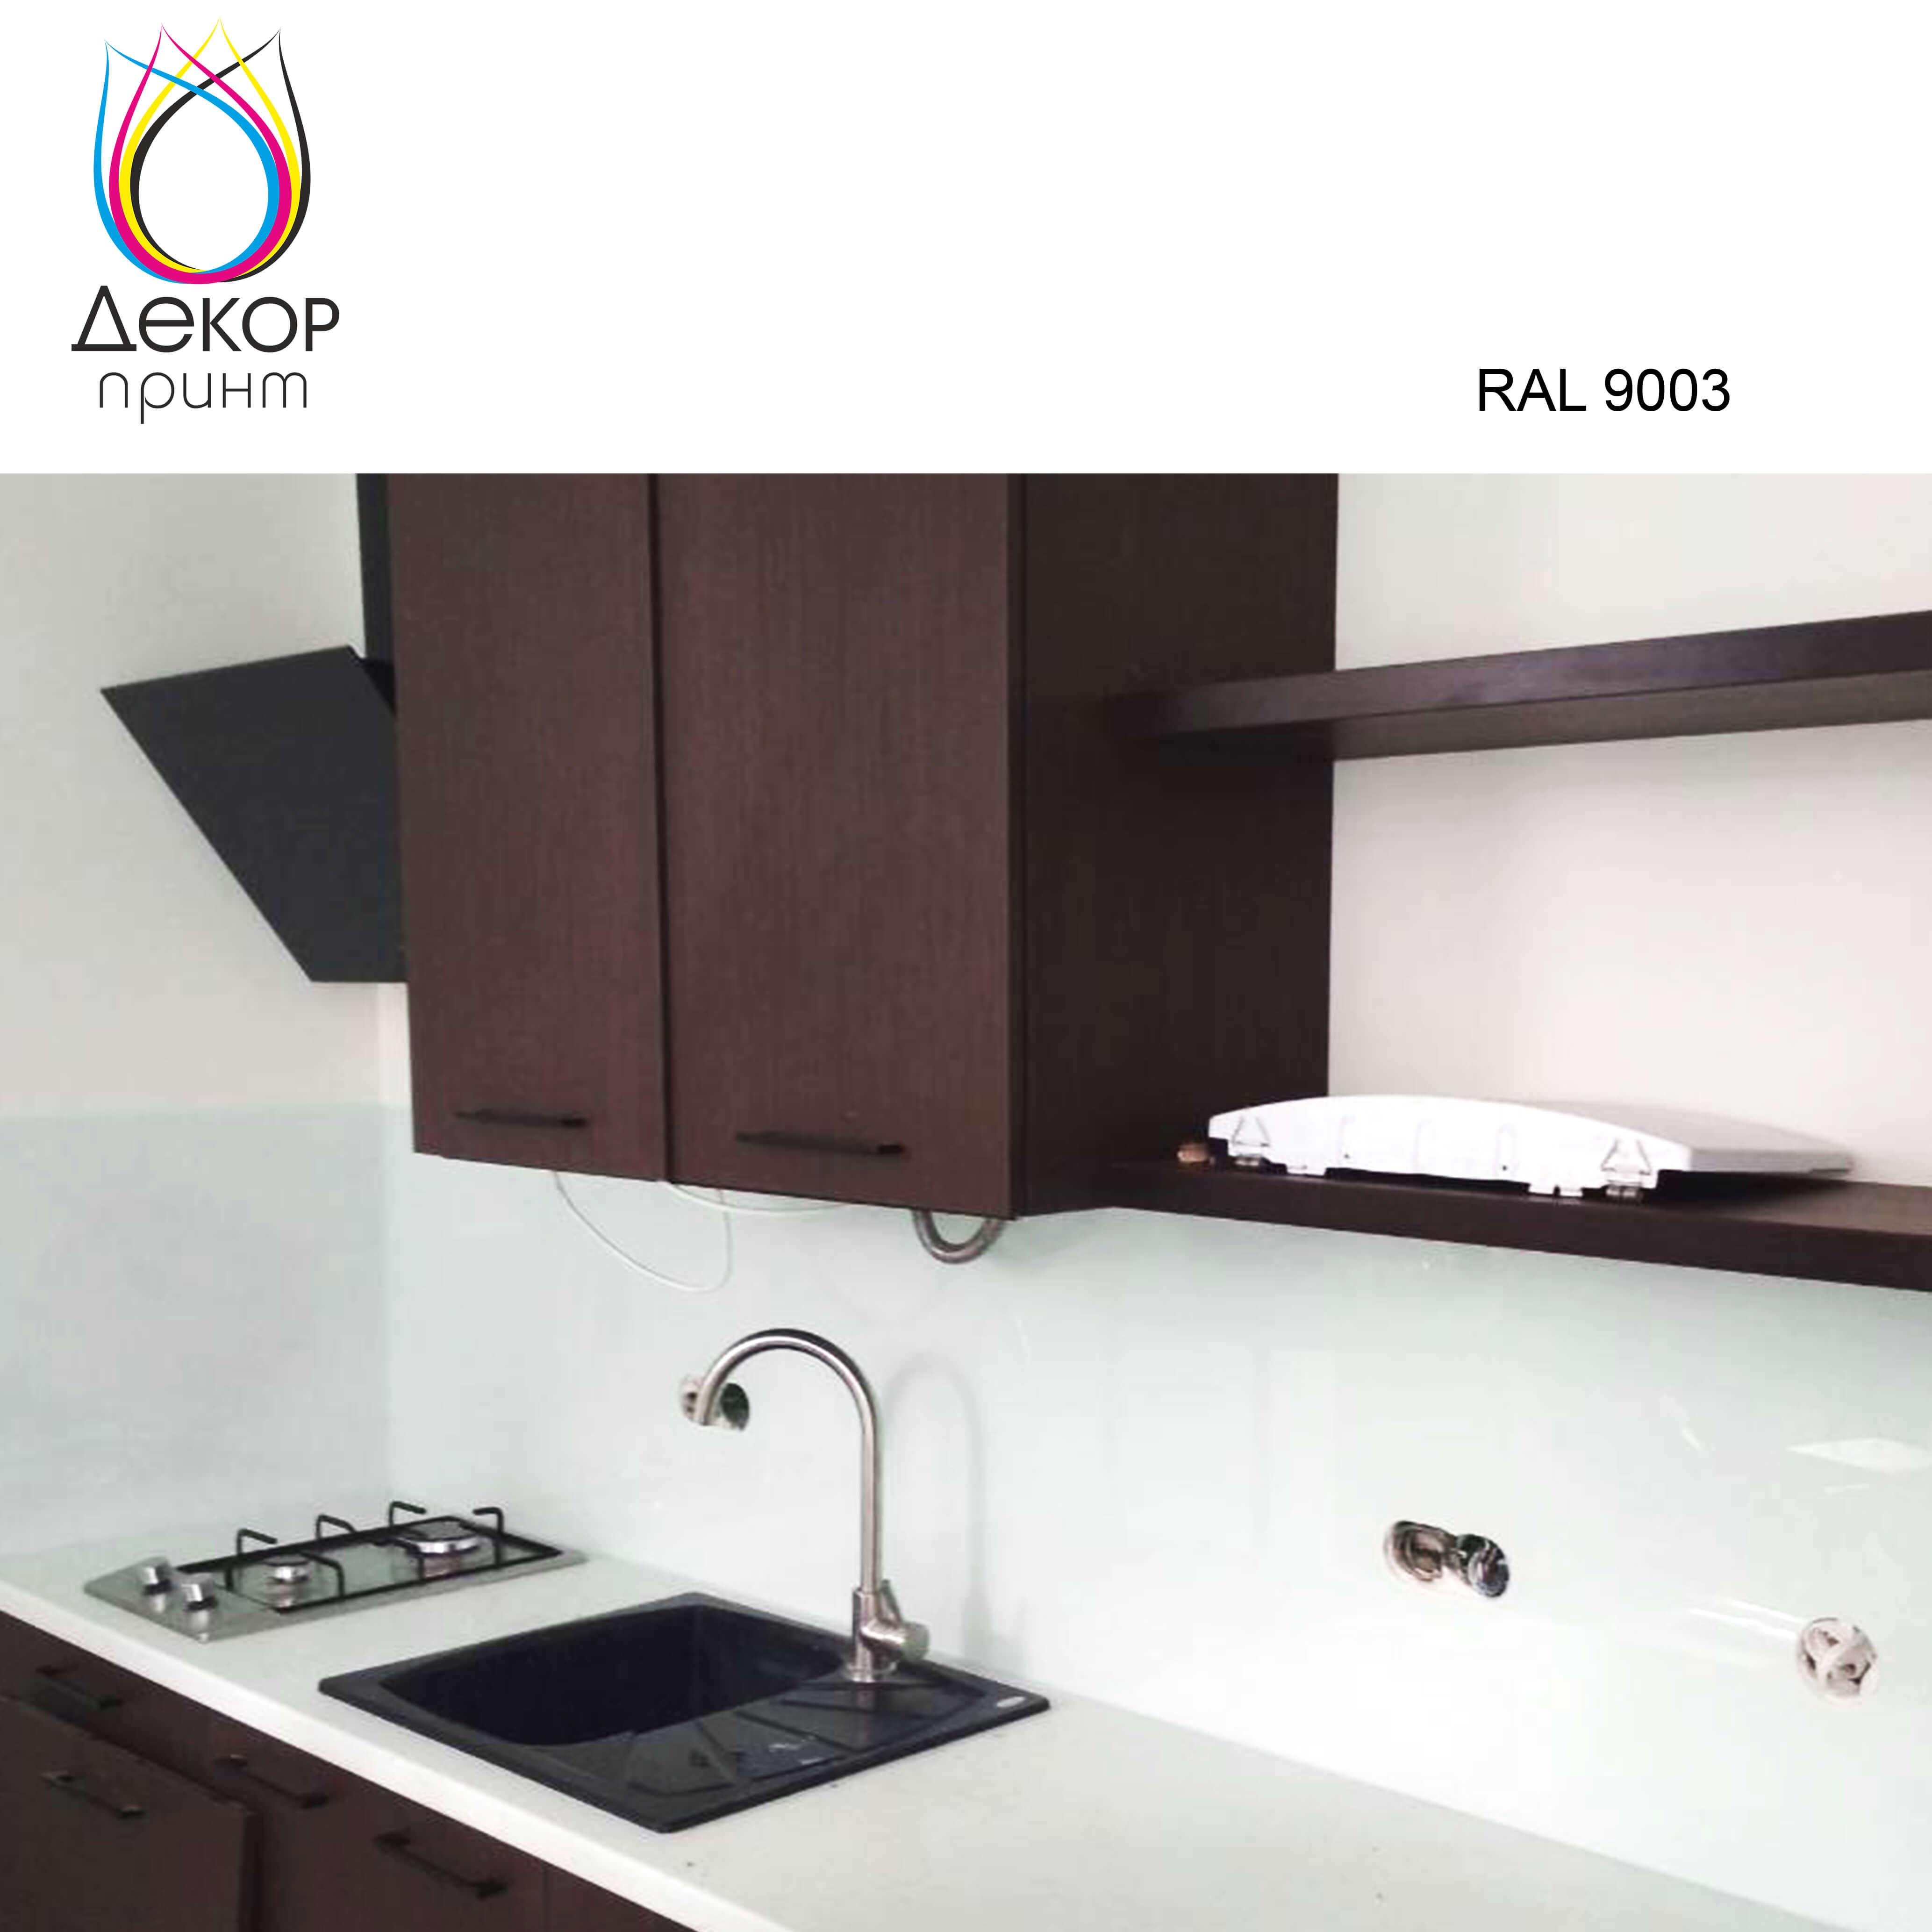 Galereya-robit-249